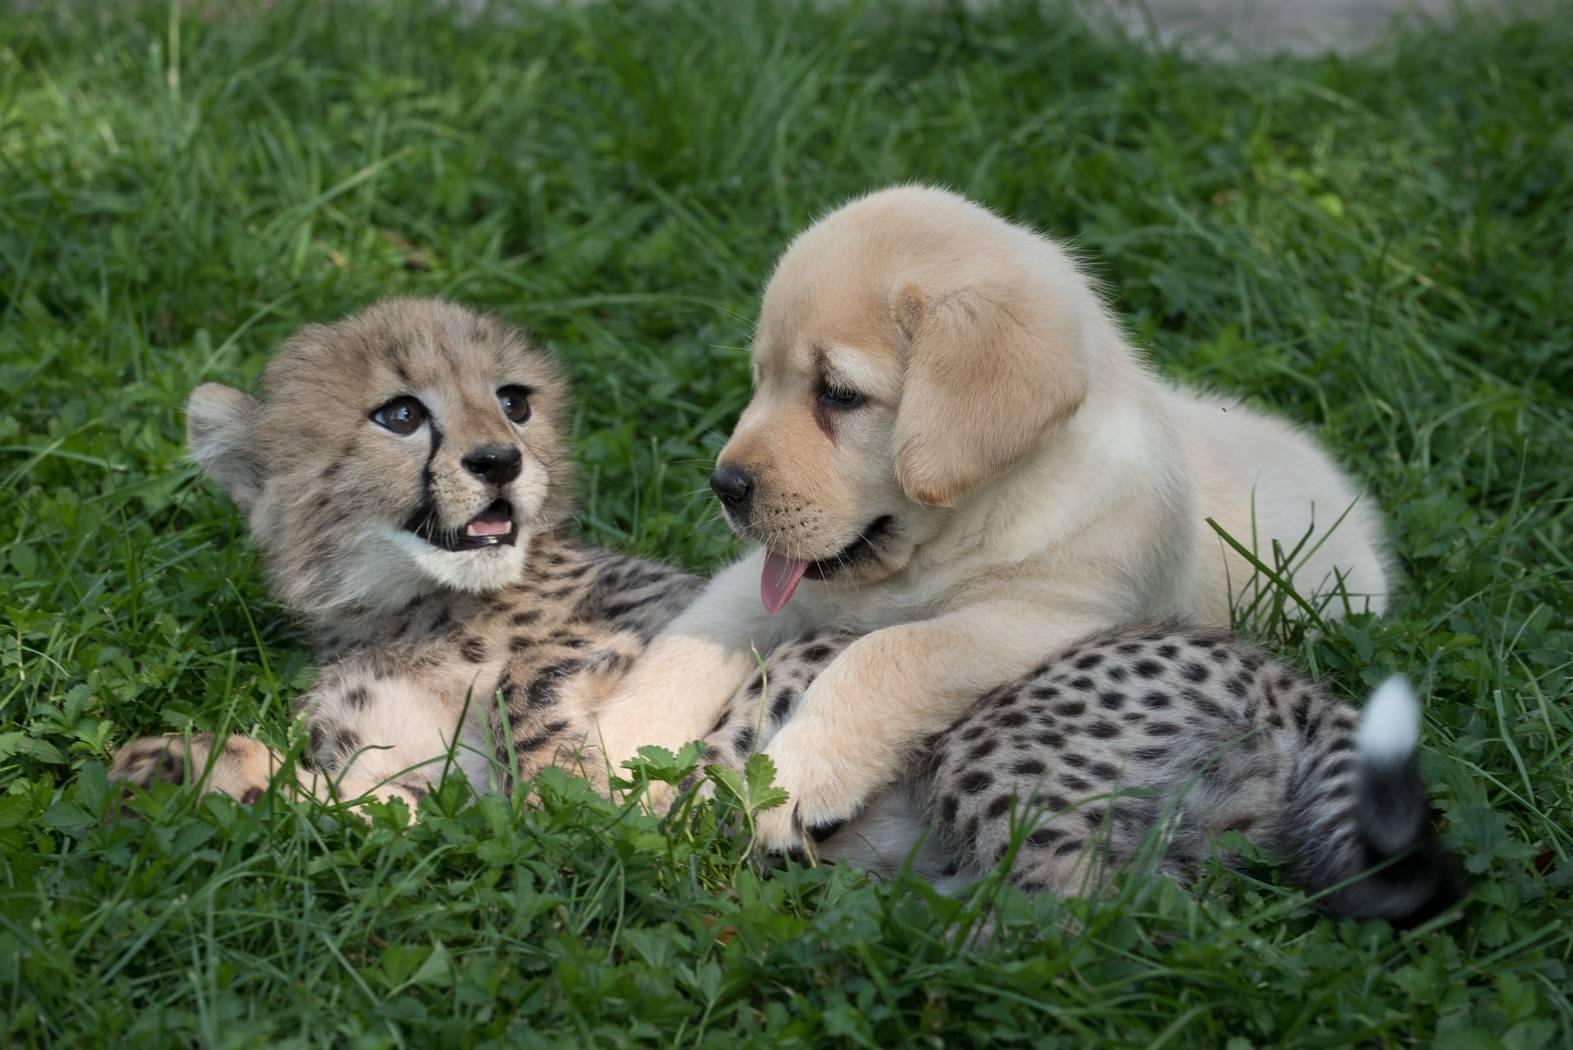 cheetah and puppy1.jpg